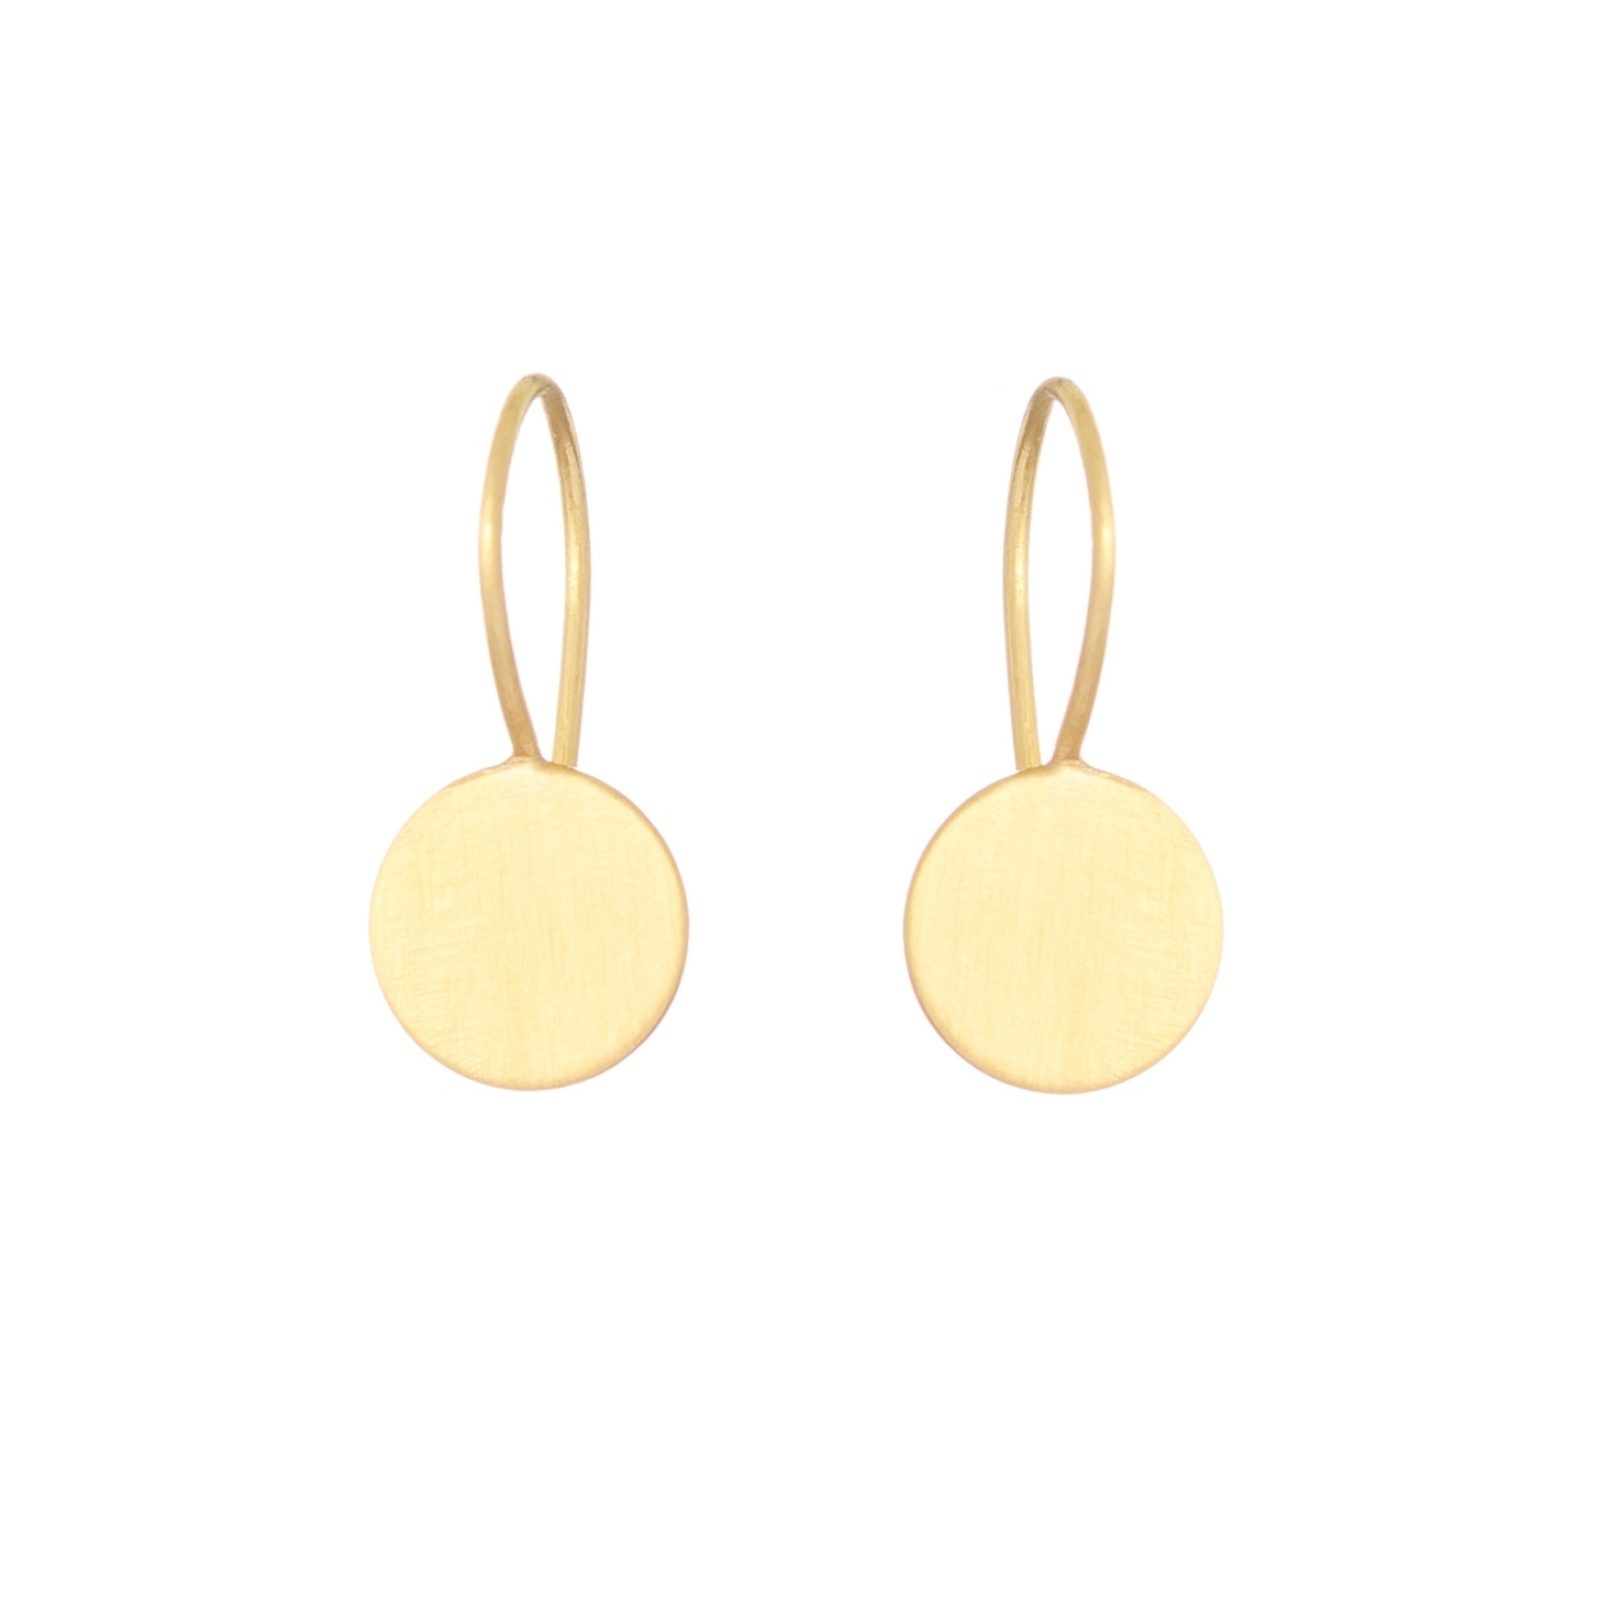 Sia Taylor KE15 Y Yellow Gold 8mm Moon Drop Earring WB